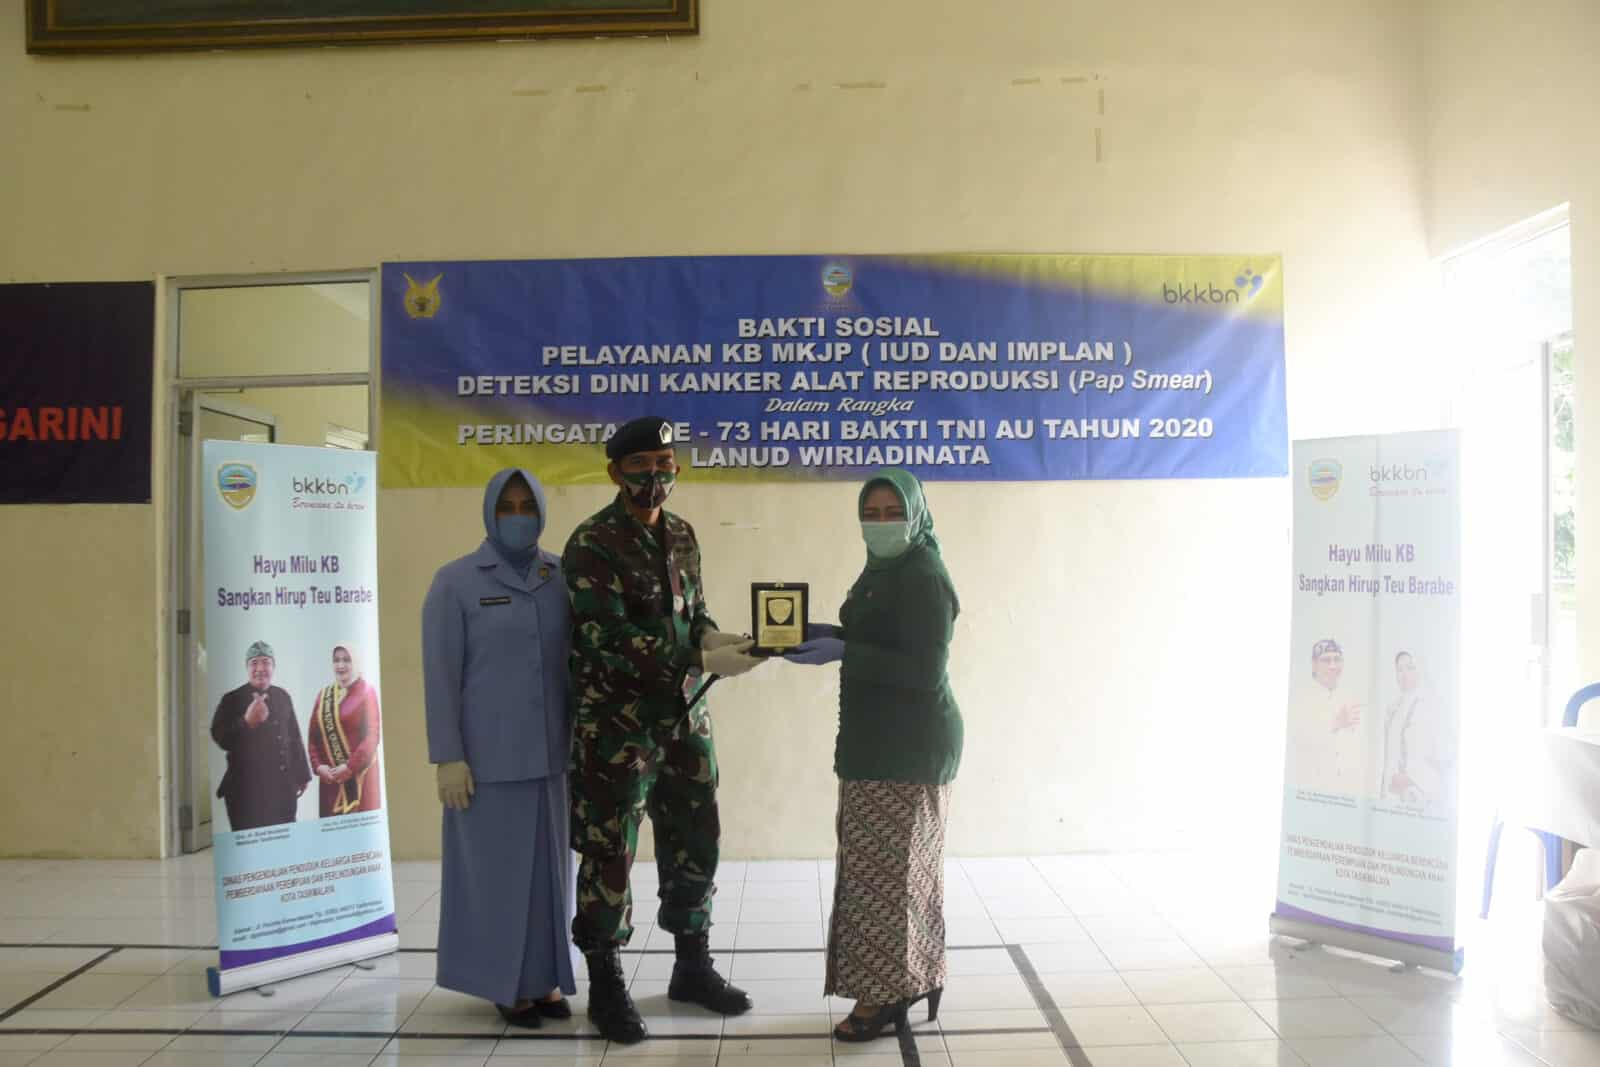 Cegah Kanker Serviks Lanud Wiriadinata Dan BKKBN Gelar Pemeriksaan Pap Smear